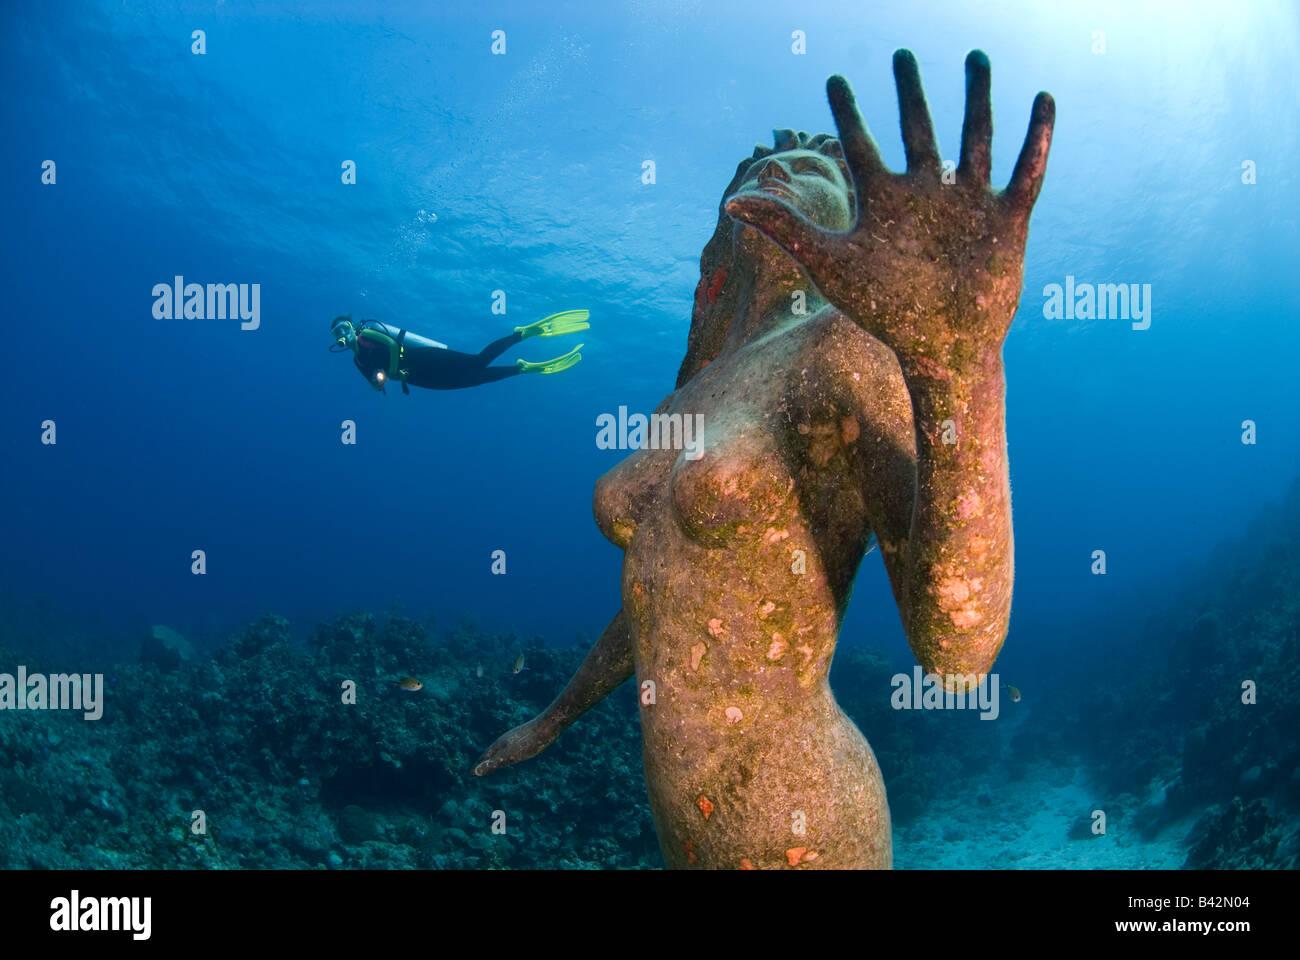 Cayman islands caribbean deepthroat blowjob sex tape 3